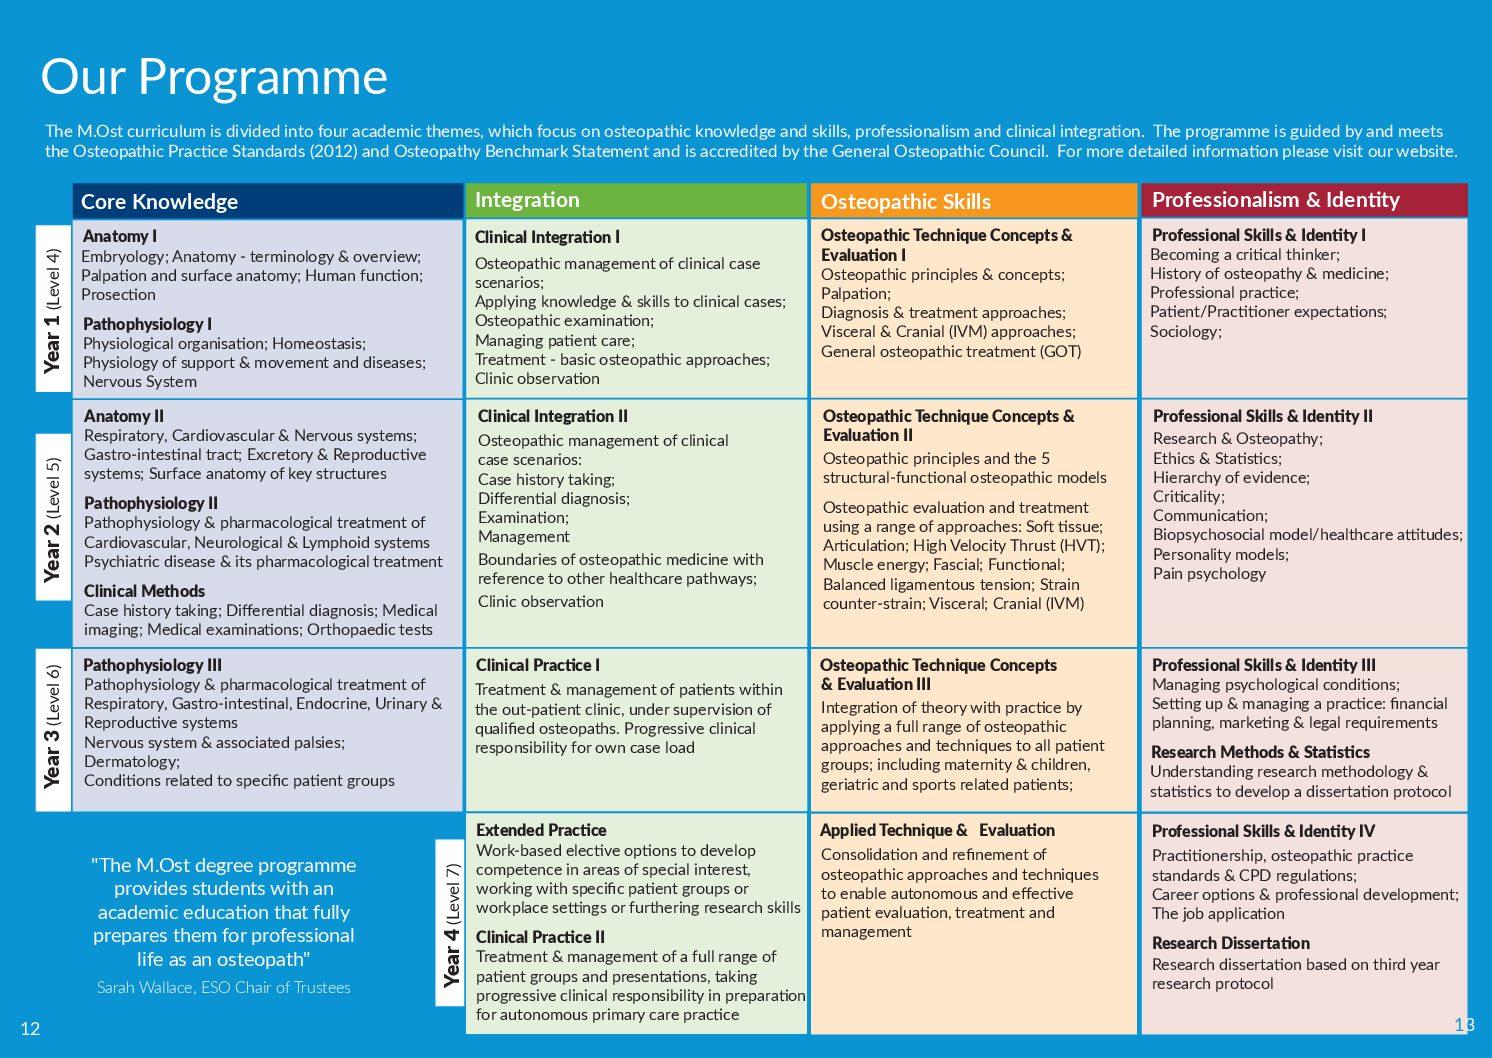 Our programme | ESO - European School of Osteopathy